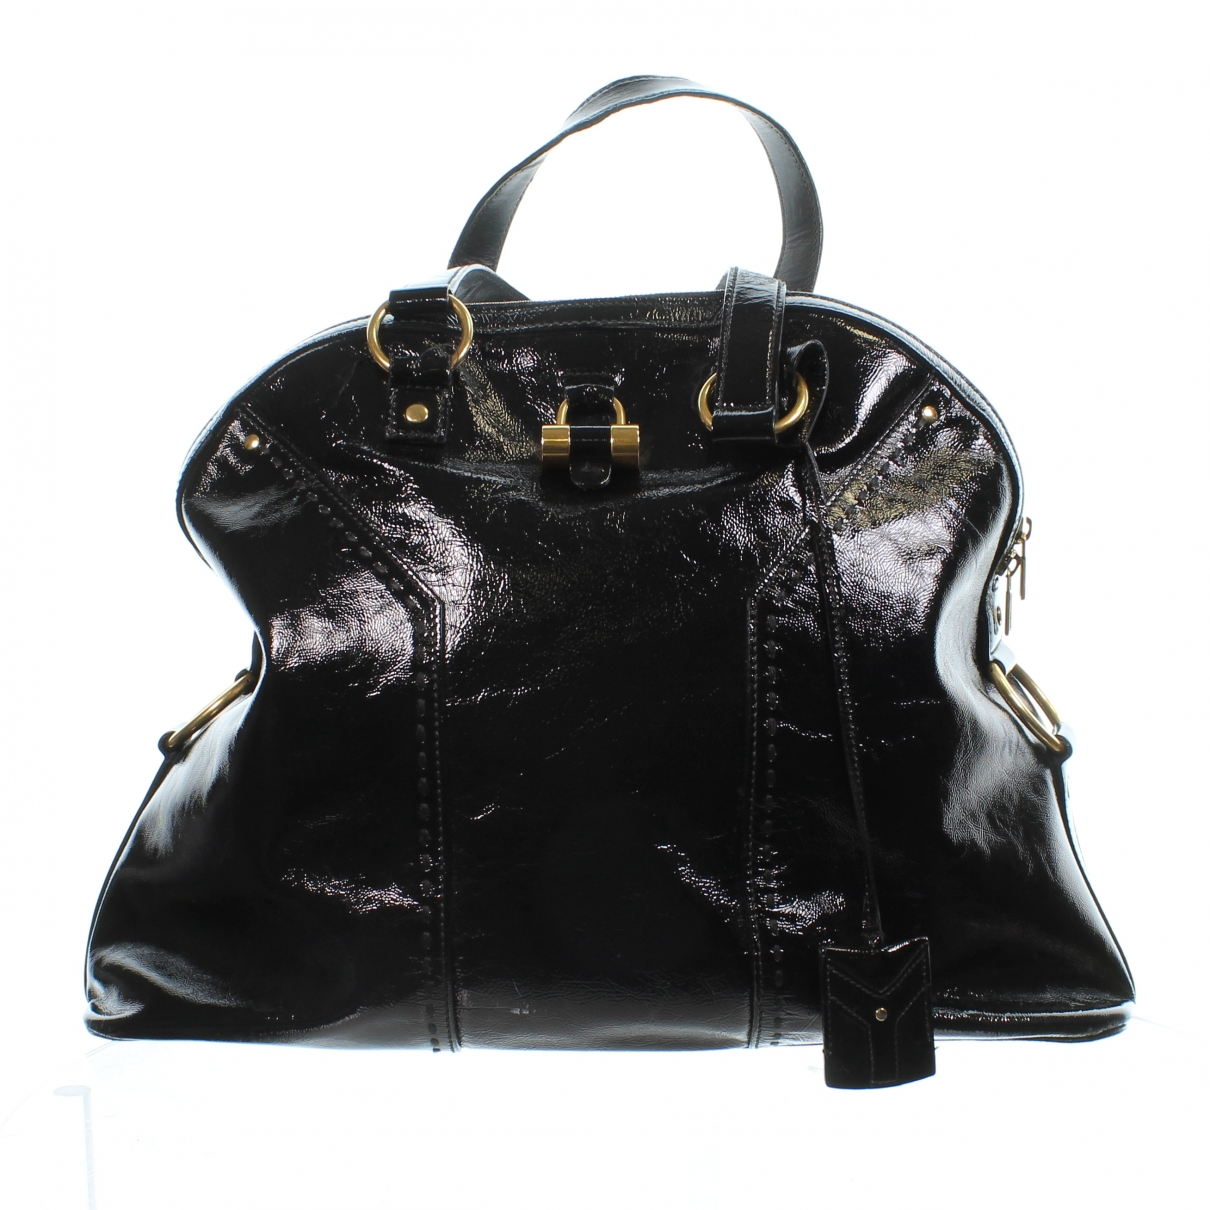 Yves Saint Laurent Muse Black Patent leather handbag for Women \N